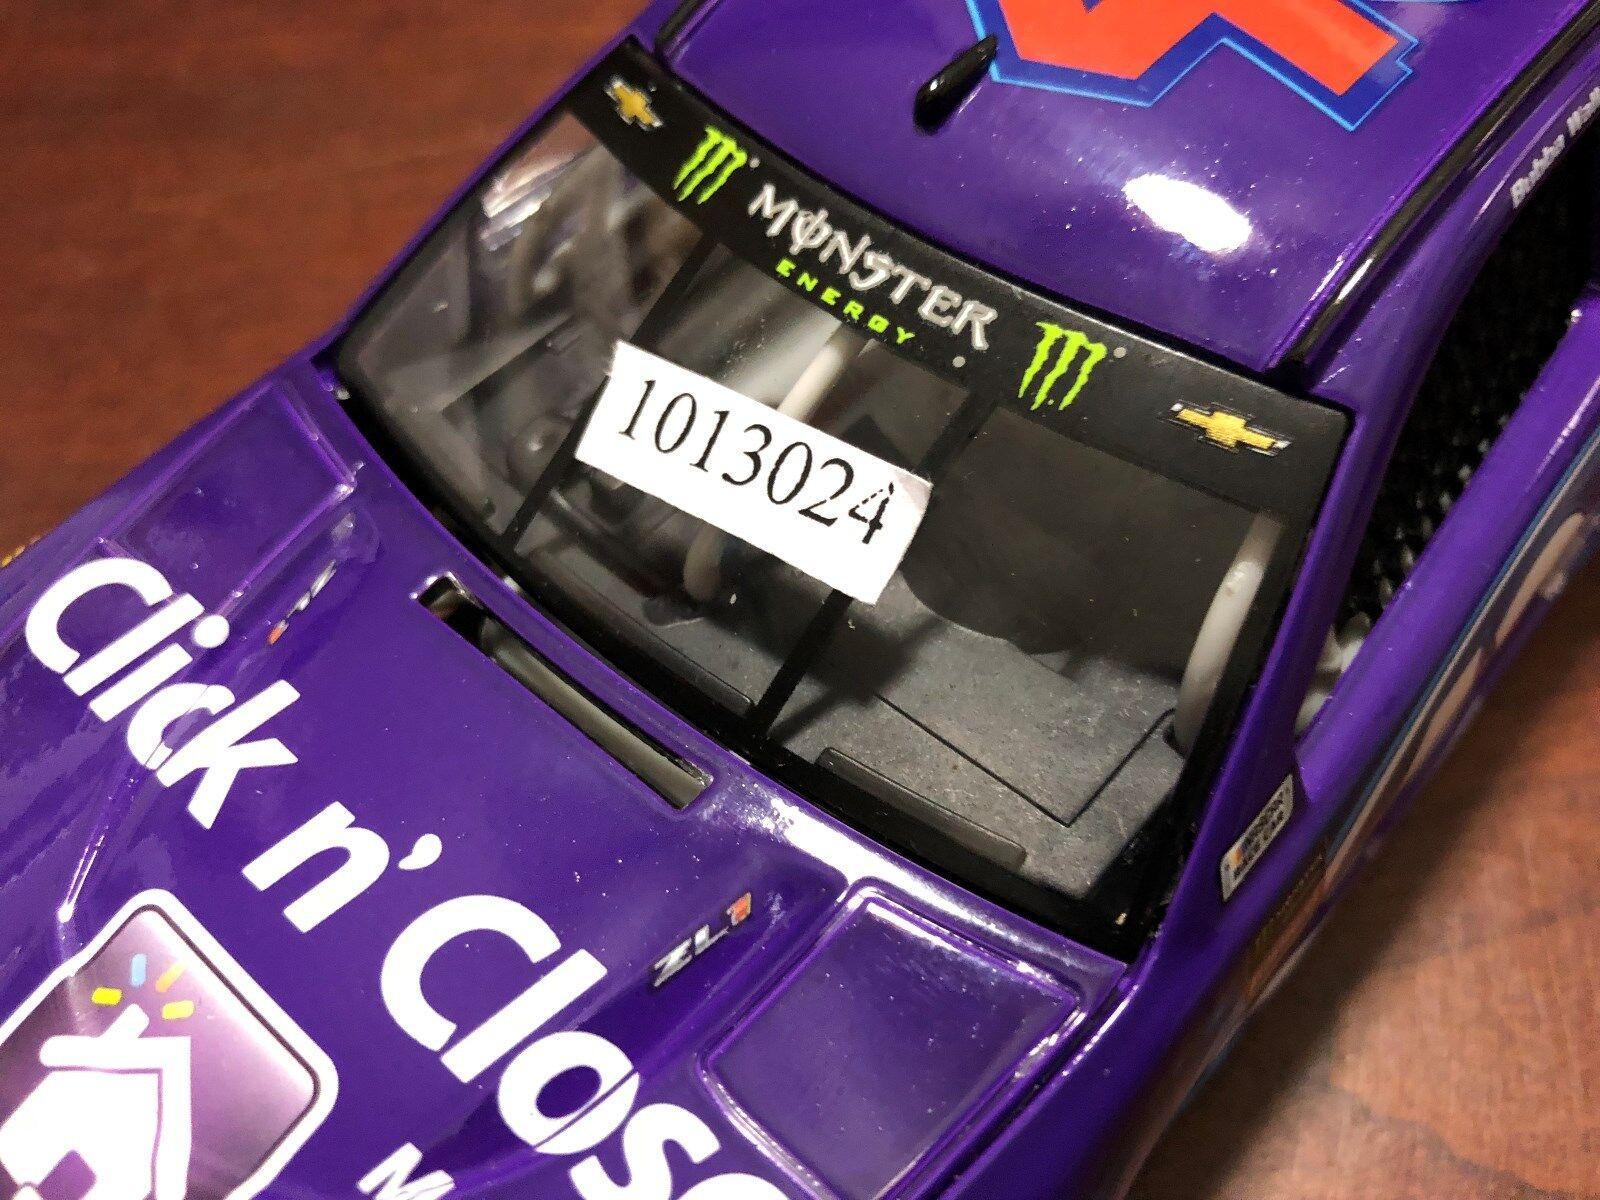 2018 Bubba Darrell Wallace Jr Click N cerca 1st projootipo novato coche Daytona 500